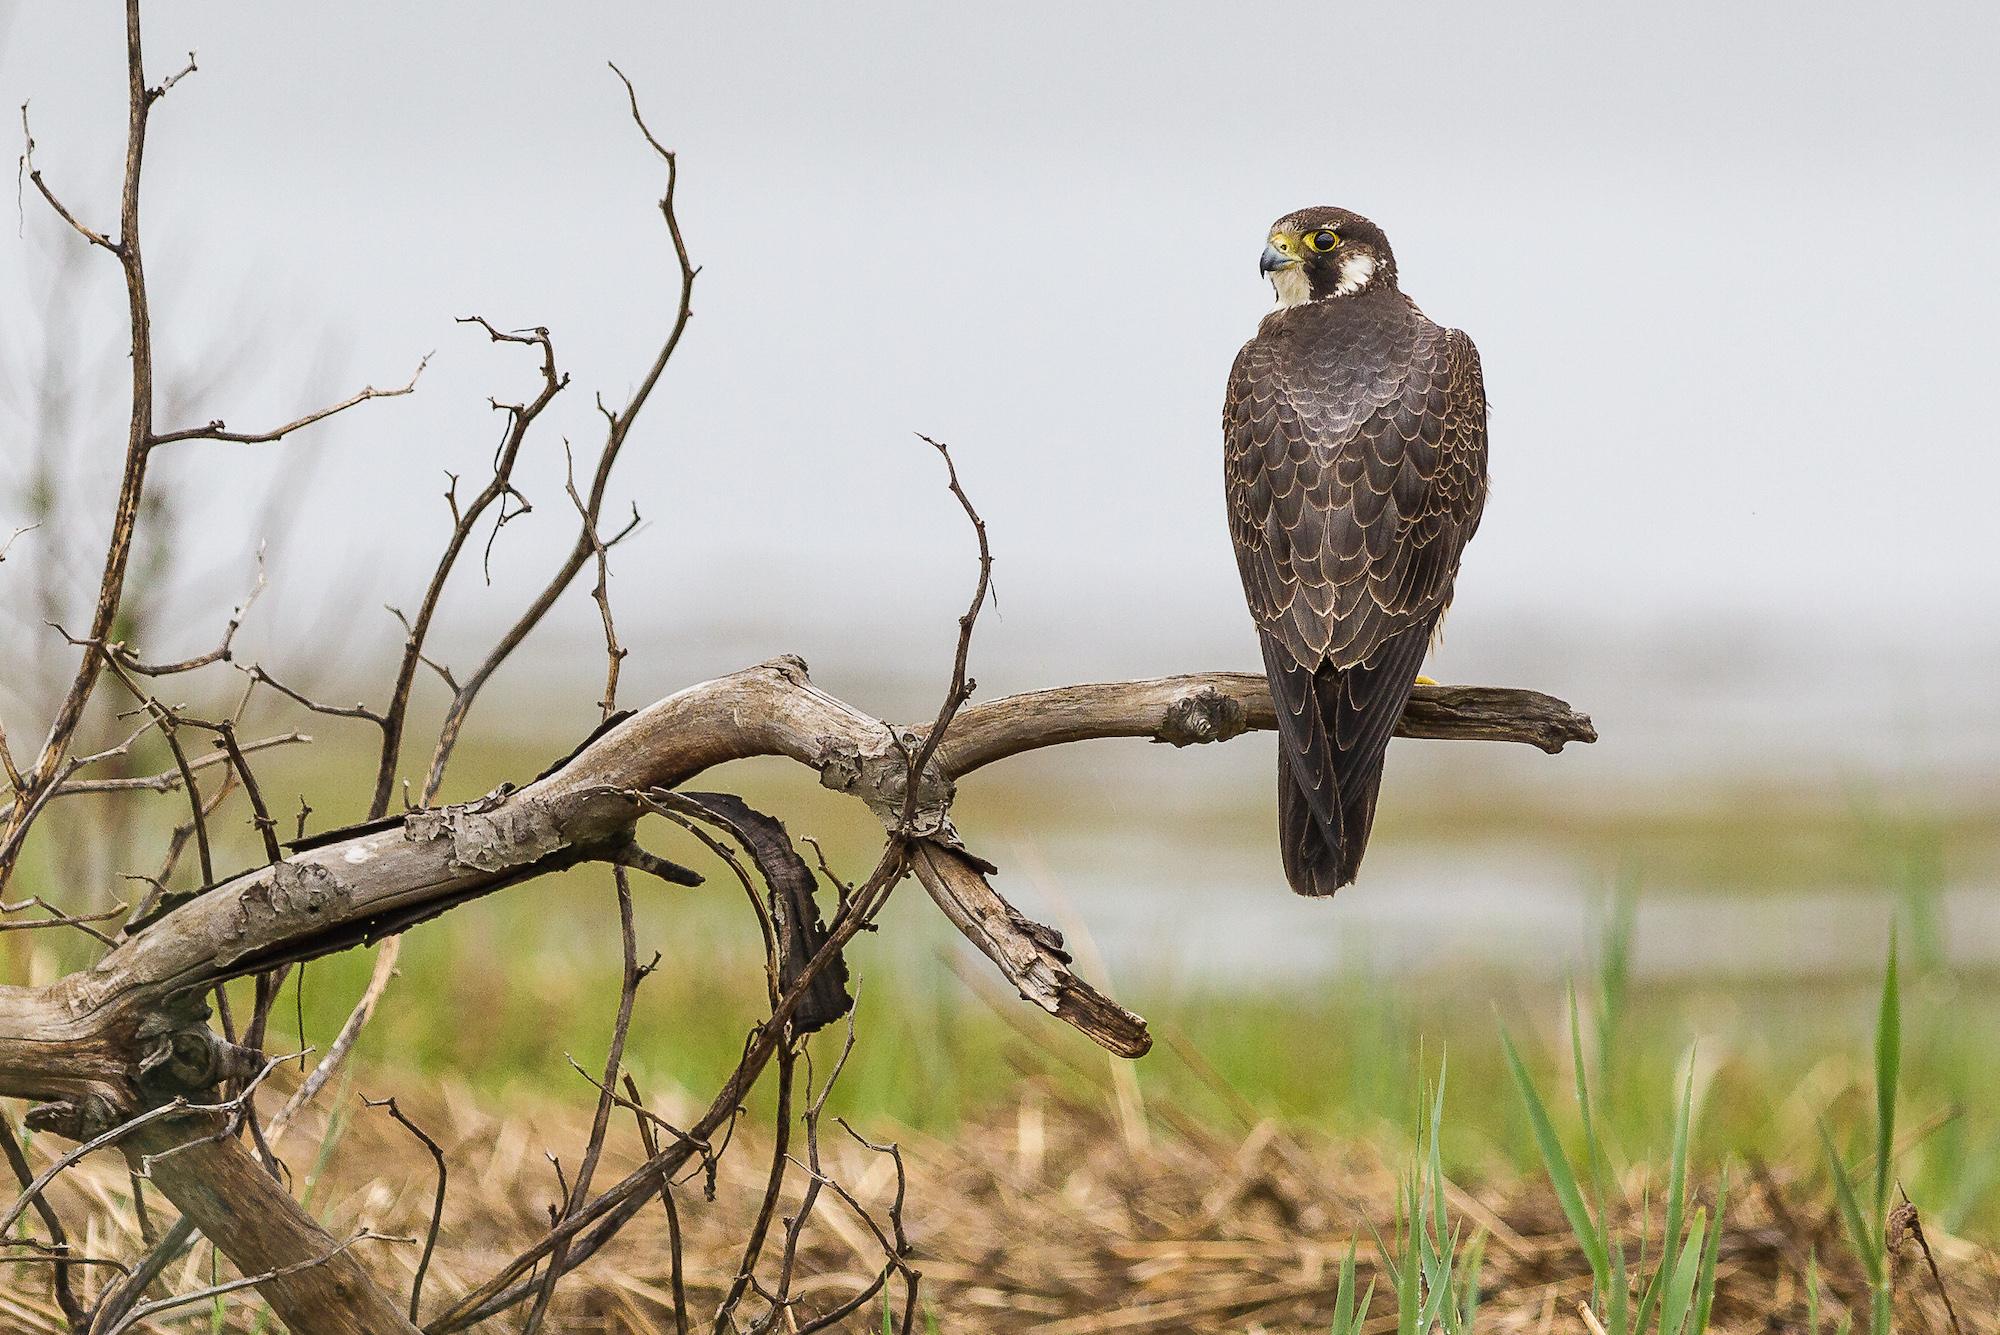 bird-killing rule